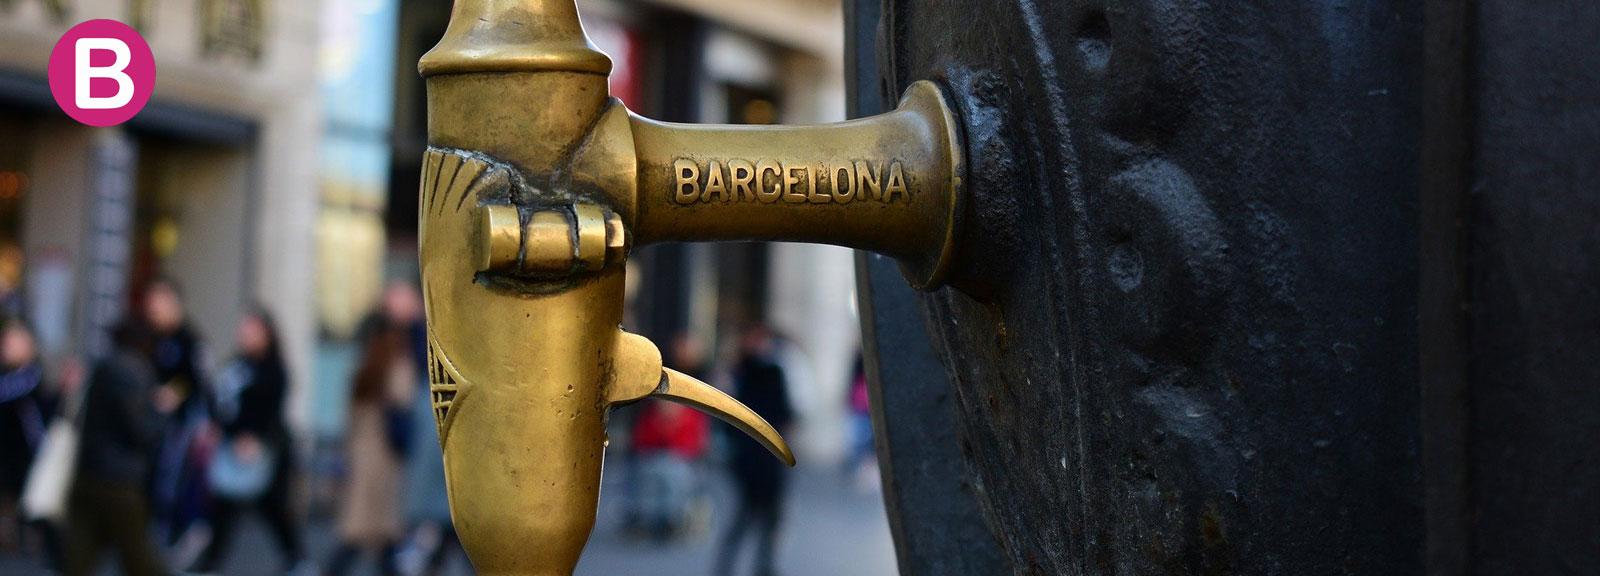 Taxi turístico en Barcelona